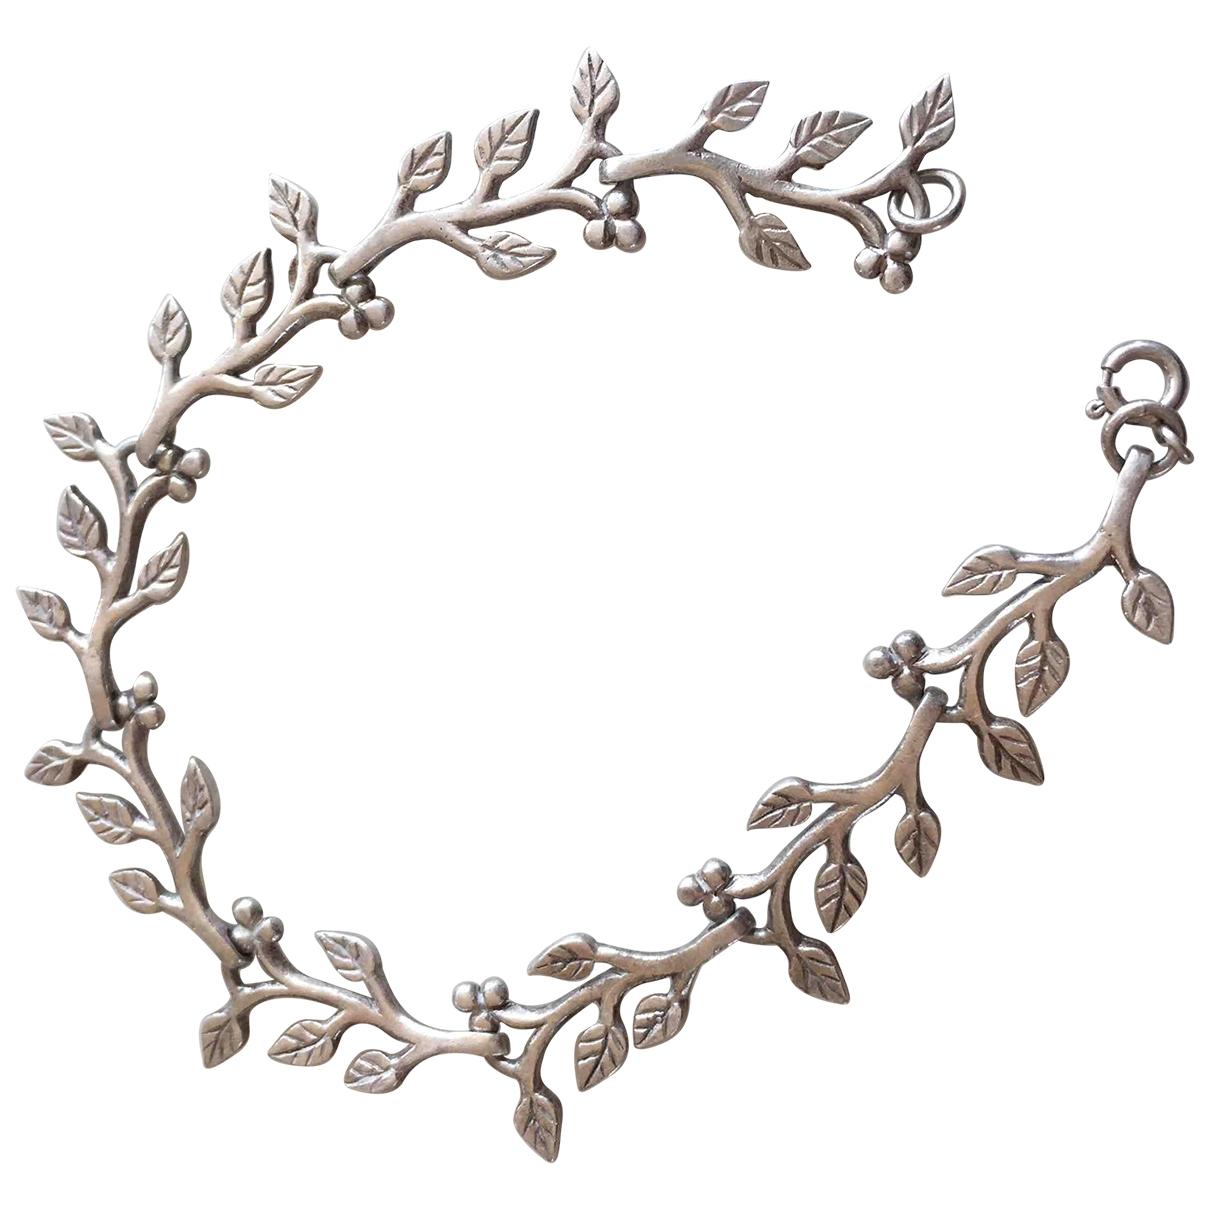 Pulsera Motifs Floraux de Plata Non Signe / Unsigned